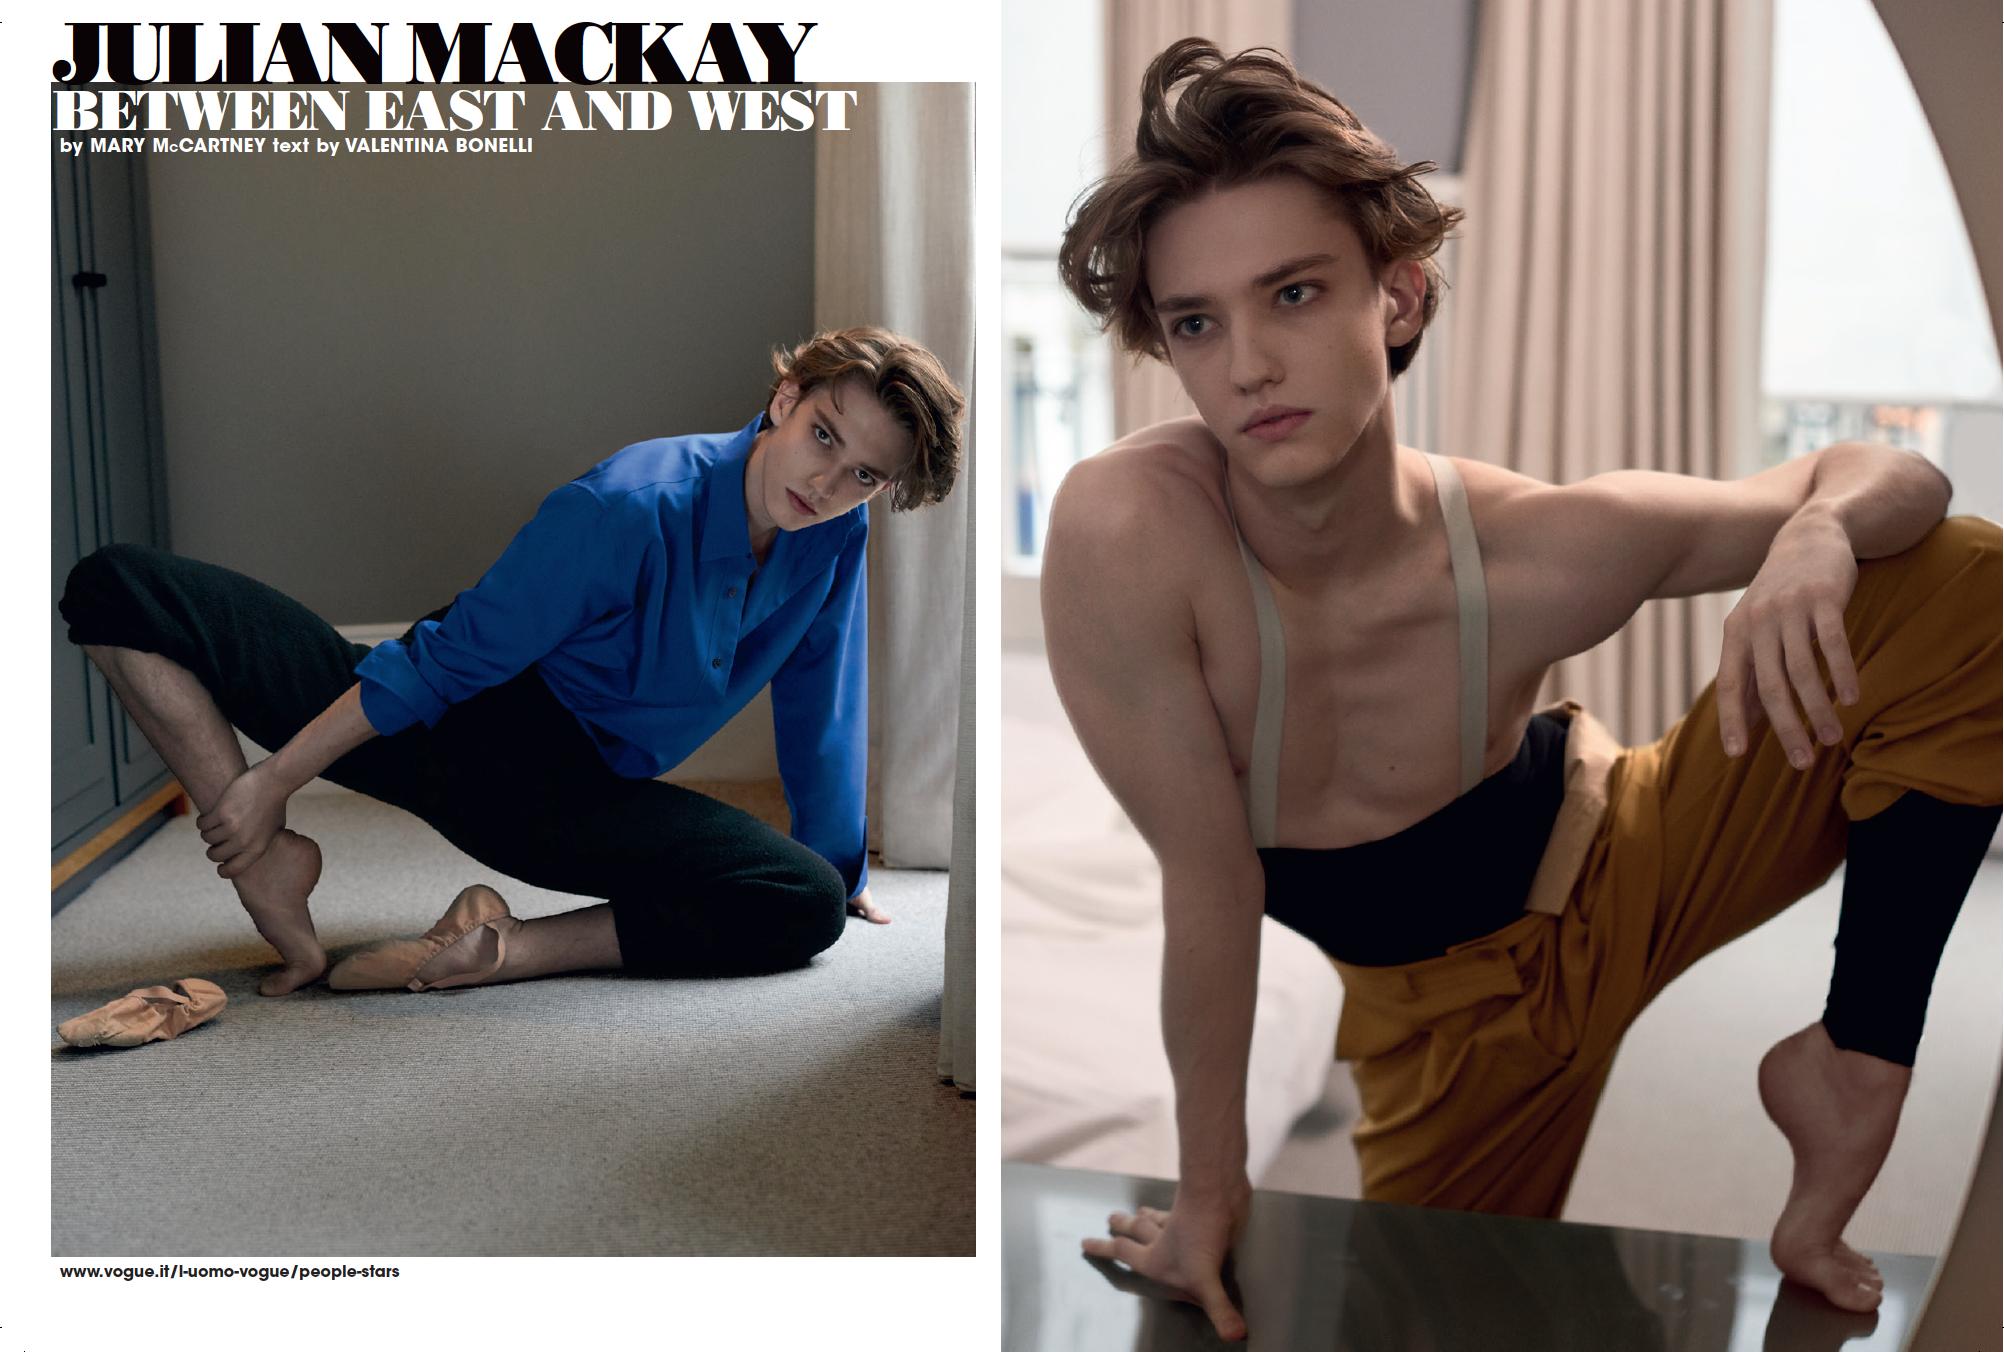 Julian Mackay in L'Uomo Vogue - ph. Mary Mc Cartney